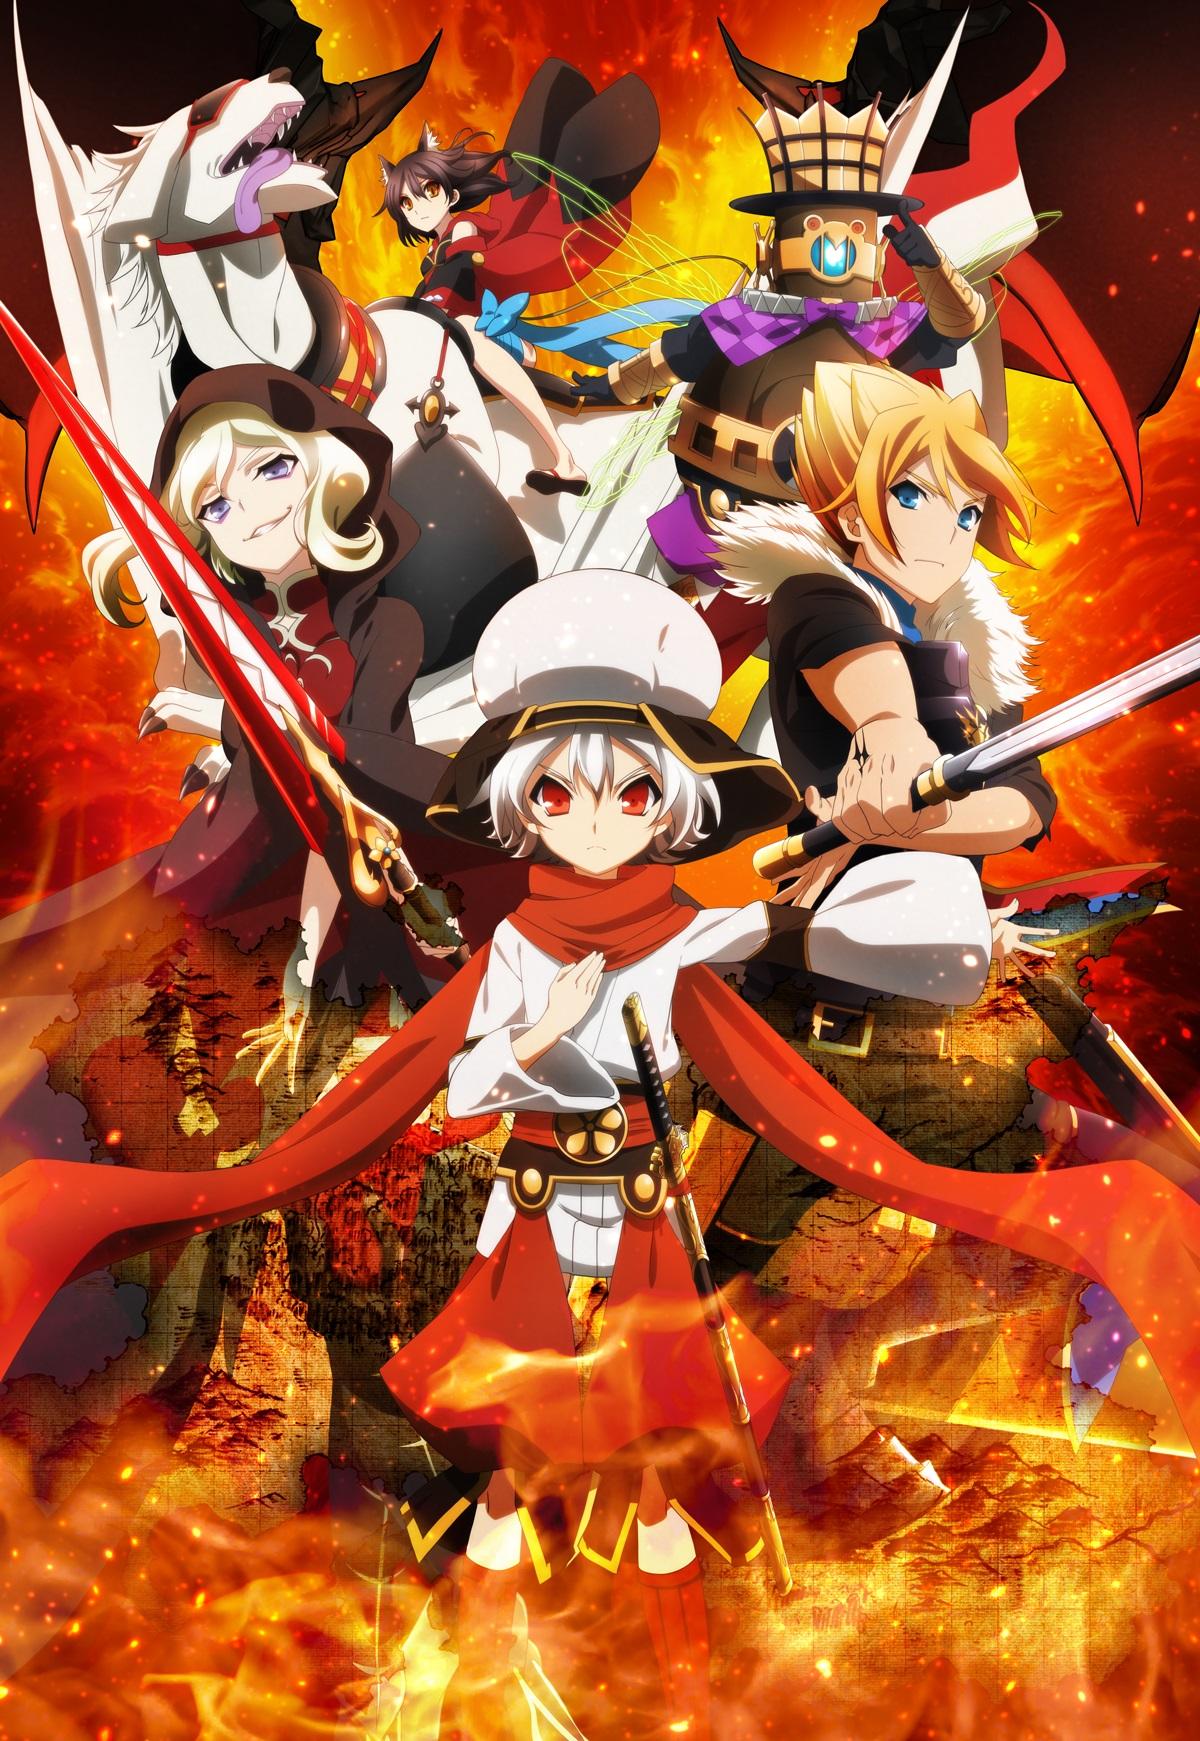 Chaos Dragon: Sekiryuu Seneki